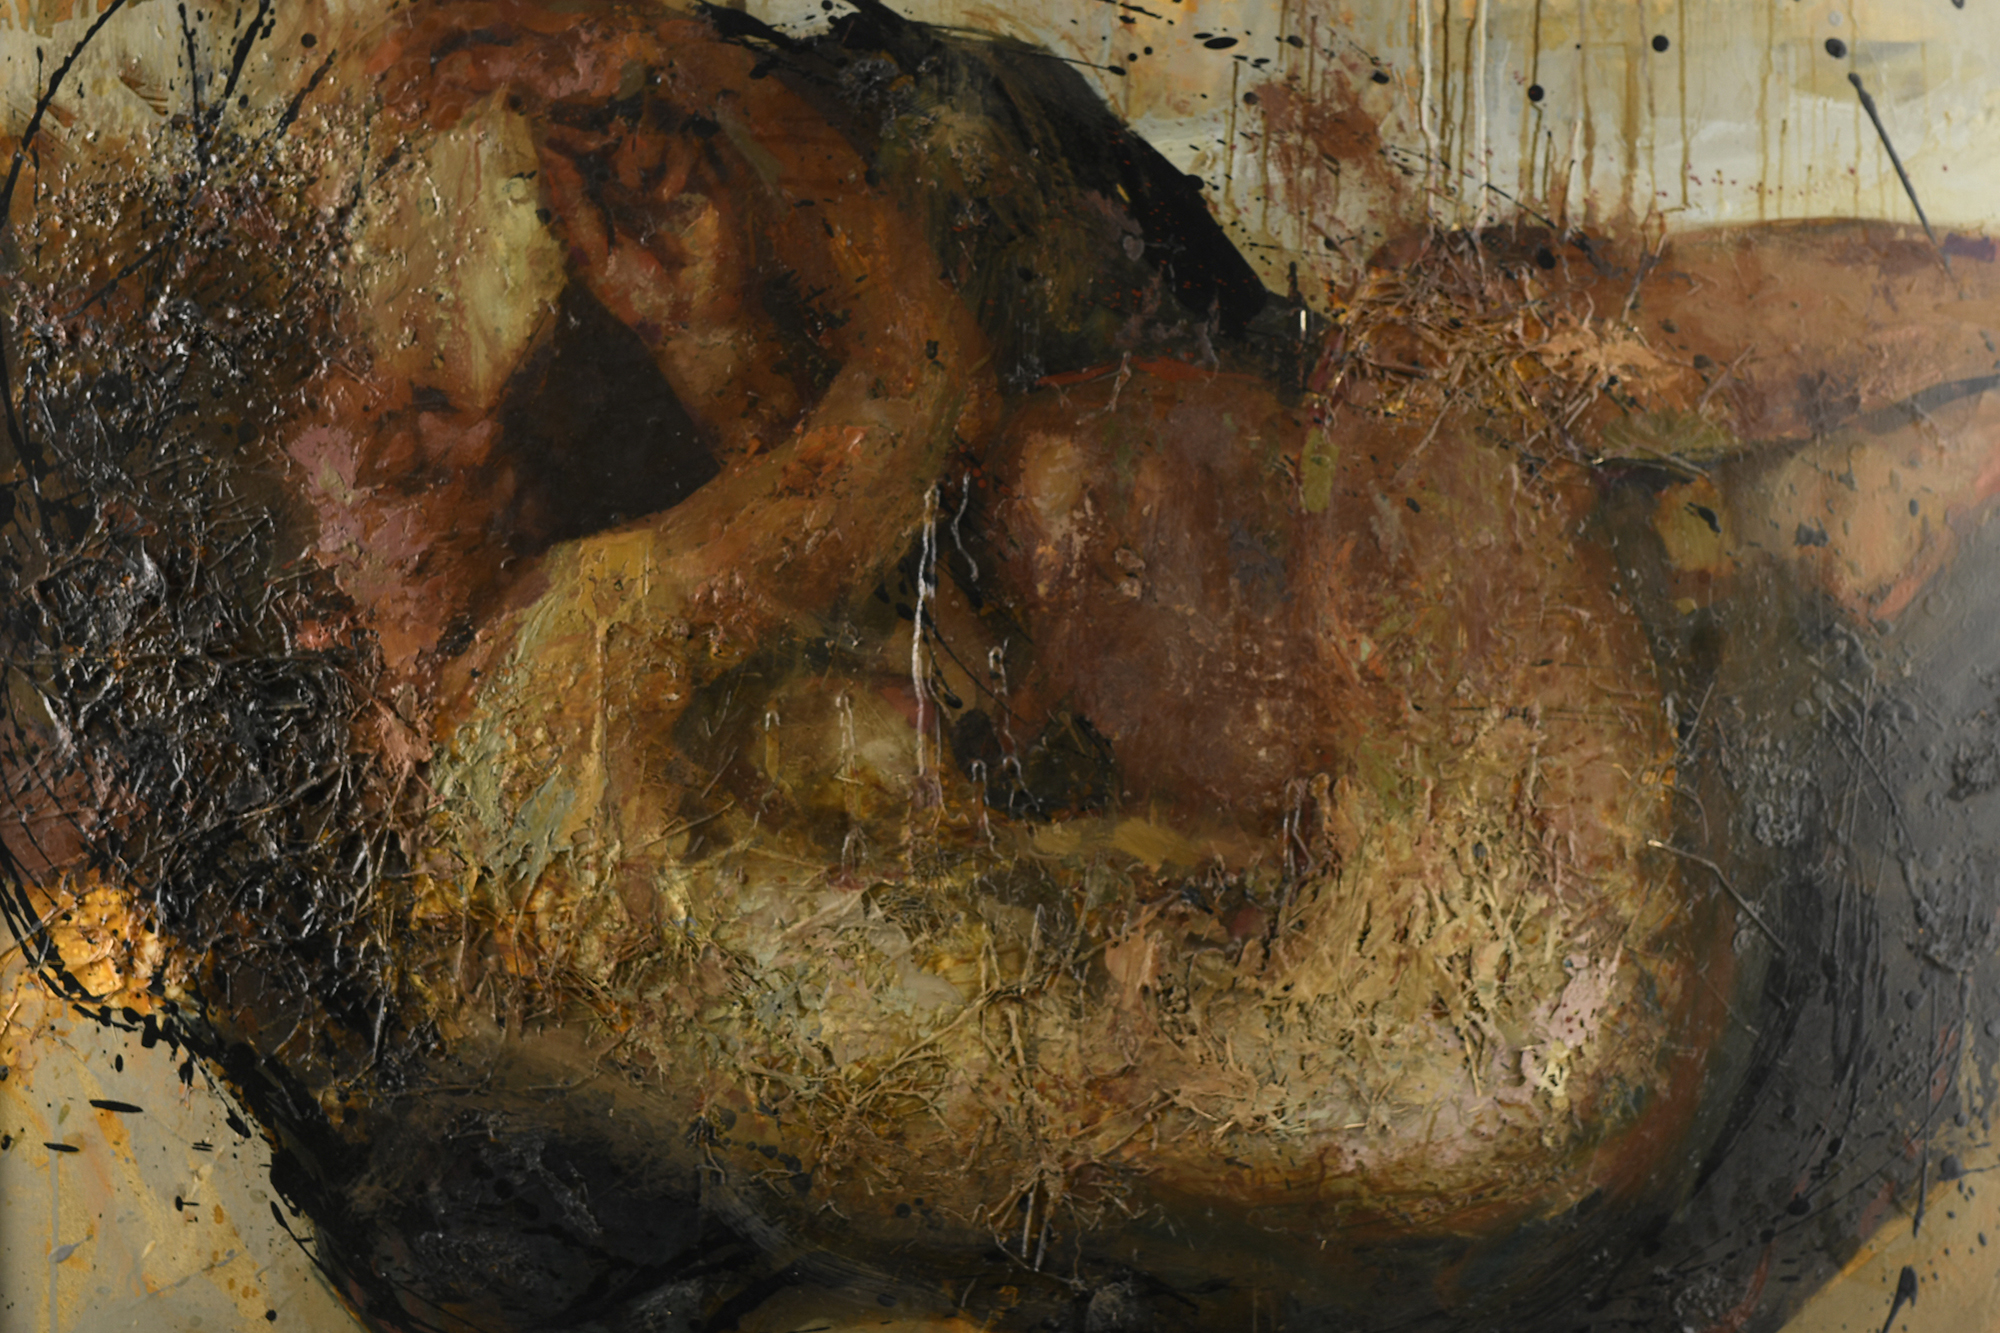 Stunning Original Painting by Renowned Scottish artist Alan McGowan. - Image 10 of 22